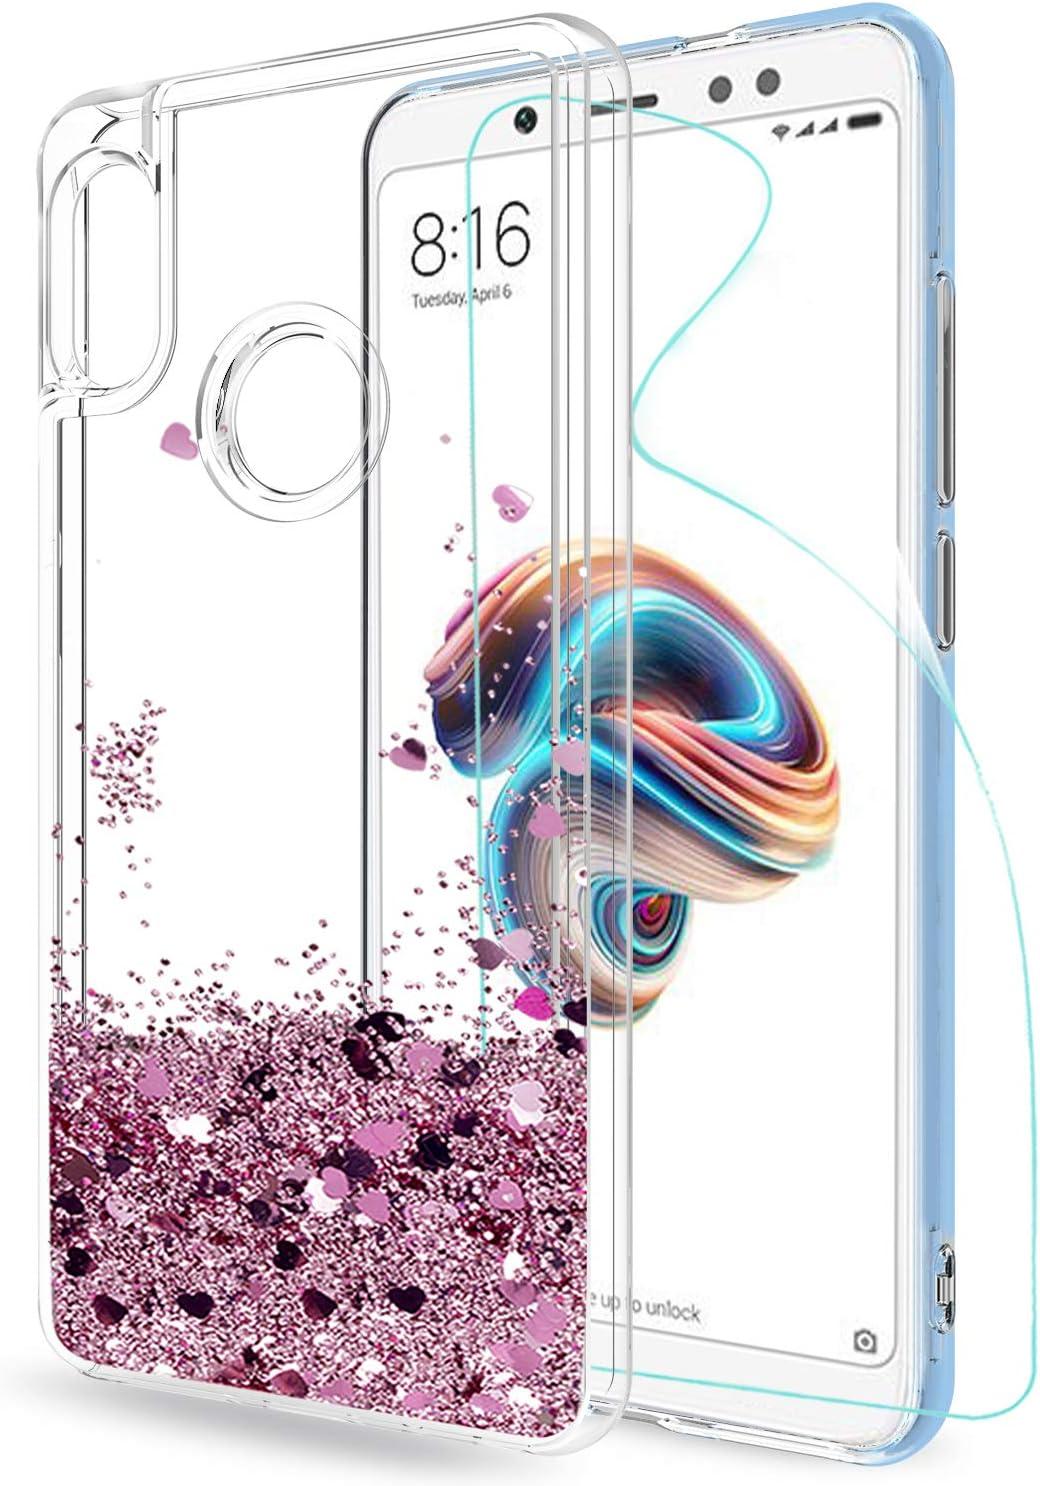 LeYi Funda Xiaomi Redmi Note 5 Silicona Purpurina Carcasa con HD Protectores de Pantalla, Transparente Cristal Bumper Gel TPU Fundas Case Cover para Movil Redmi Note 5 Pro ZX Oro Rosa